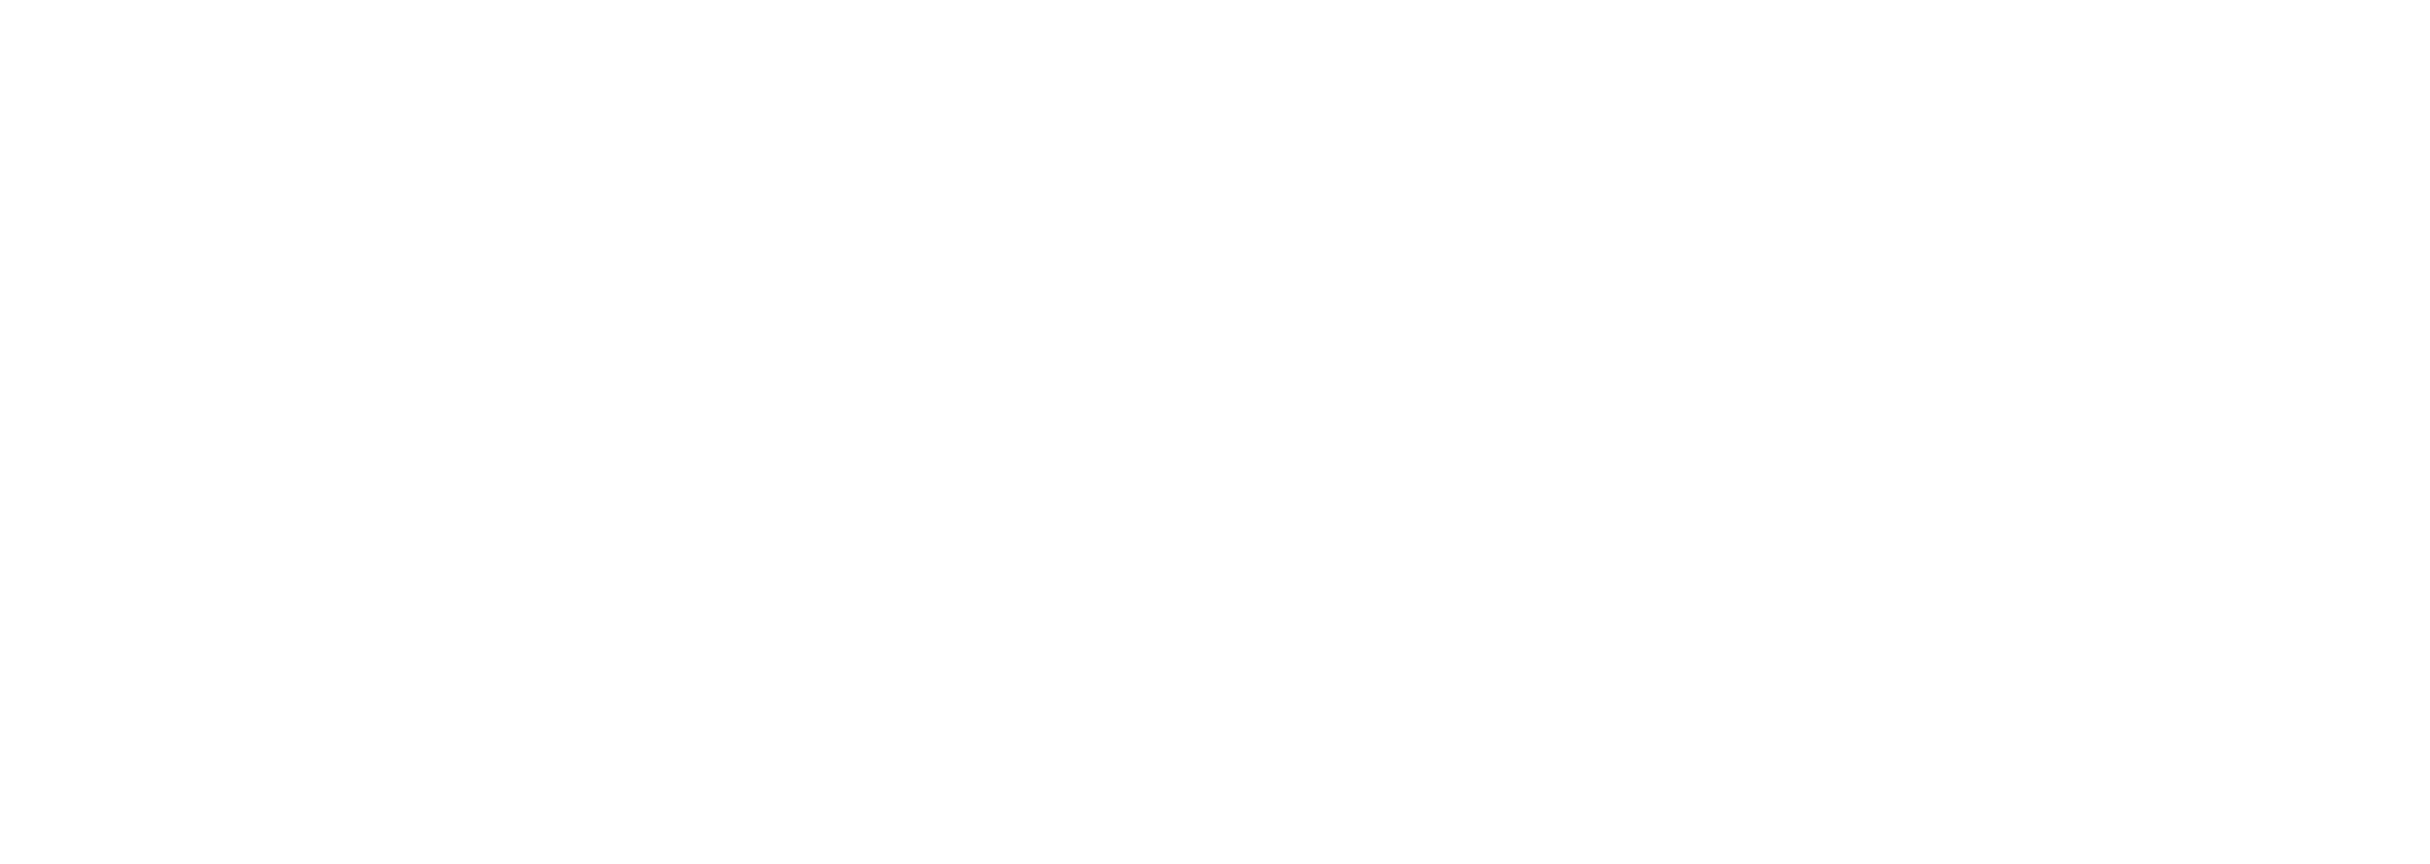 Logo mit Bauunternehmung.png